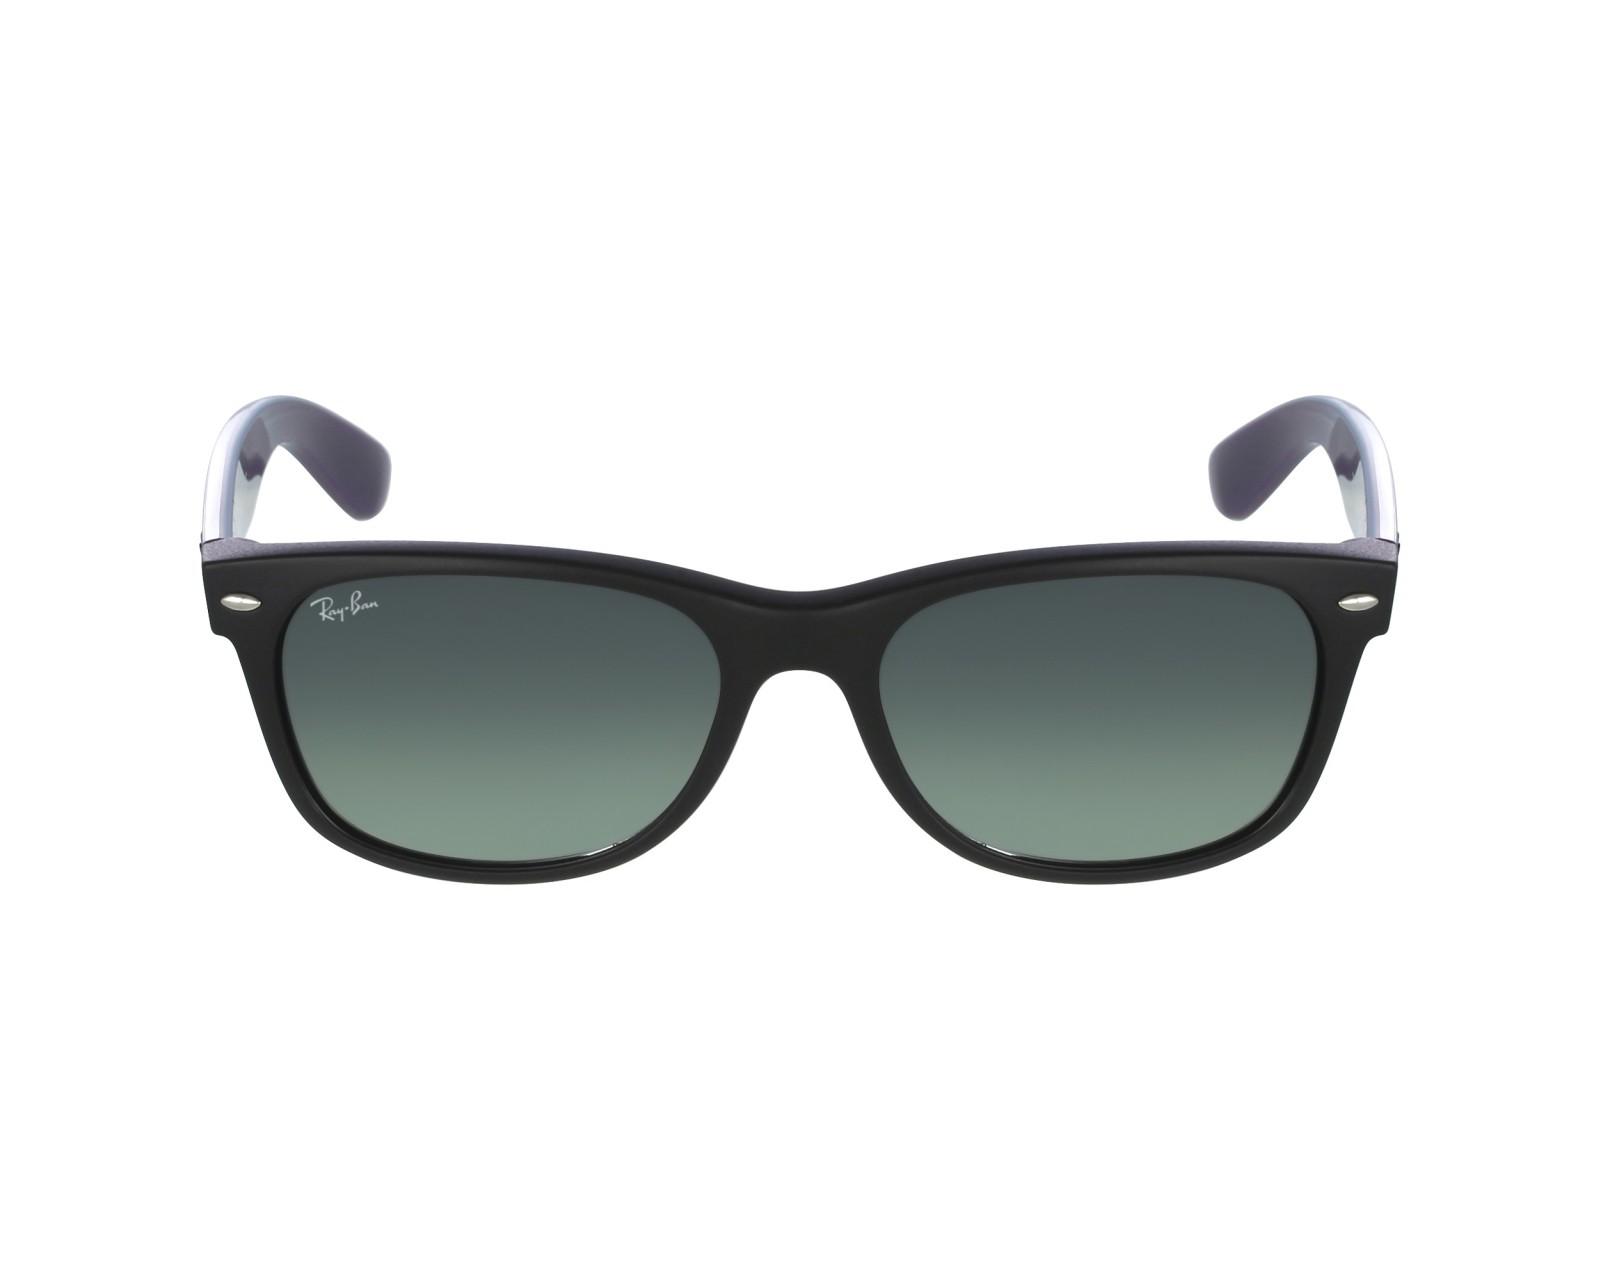 a6c75b1a8a Sunglasses Ray-Ban RB-2132 6183 71 52-18 Black Blue profile